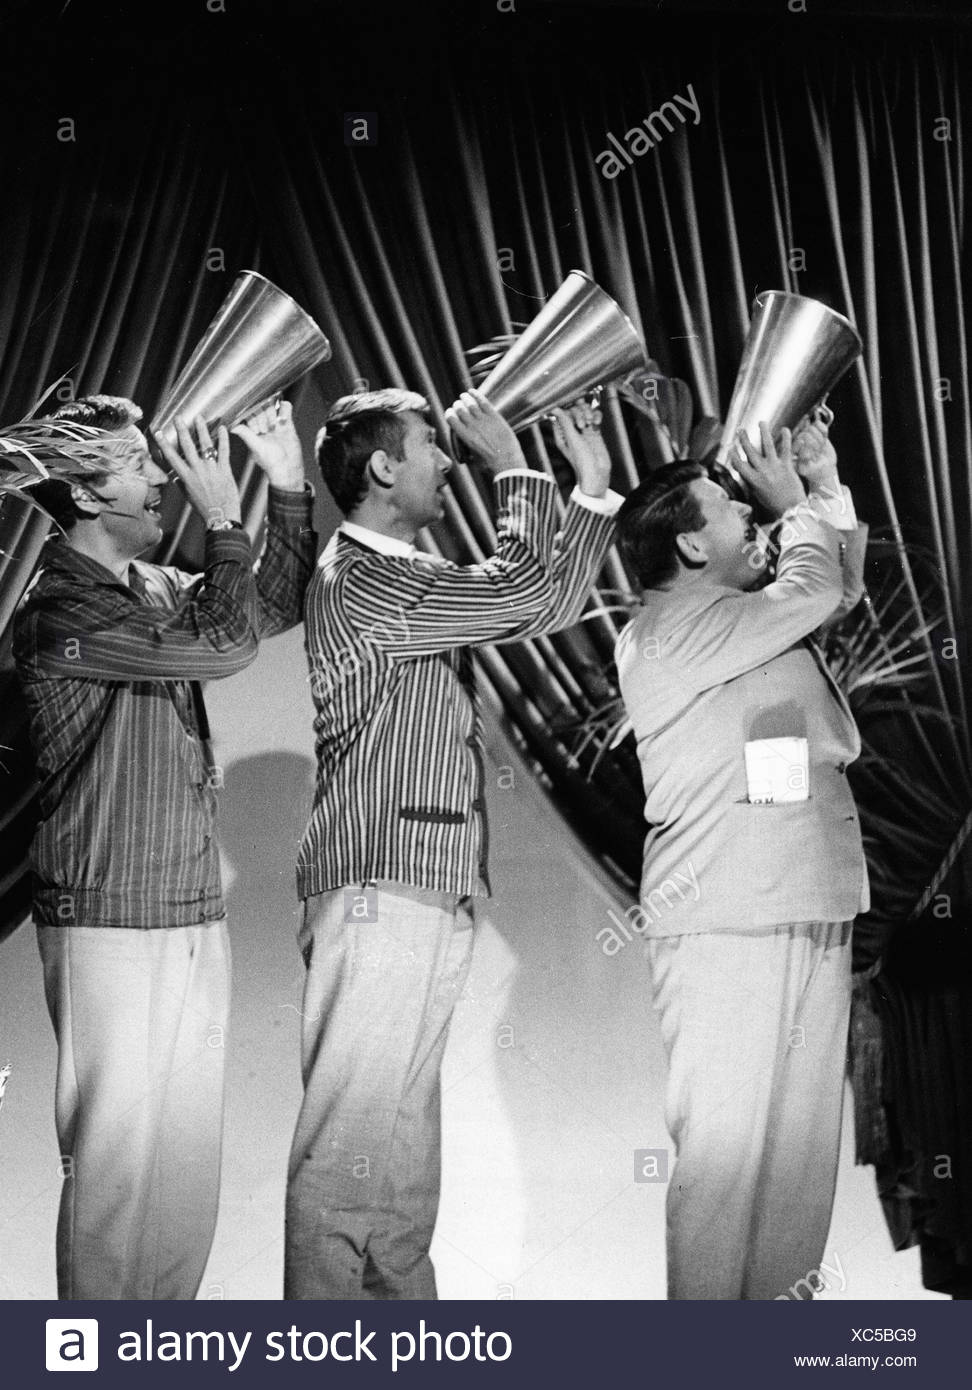 Cornel Trio, german music group, performance, TV Show 'Telebar', Berlin 20.12.1963, singing, megaphone, television show, Corn Stockbild